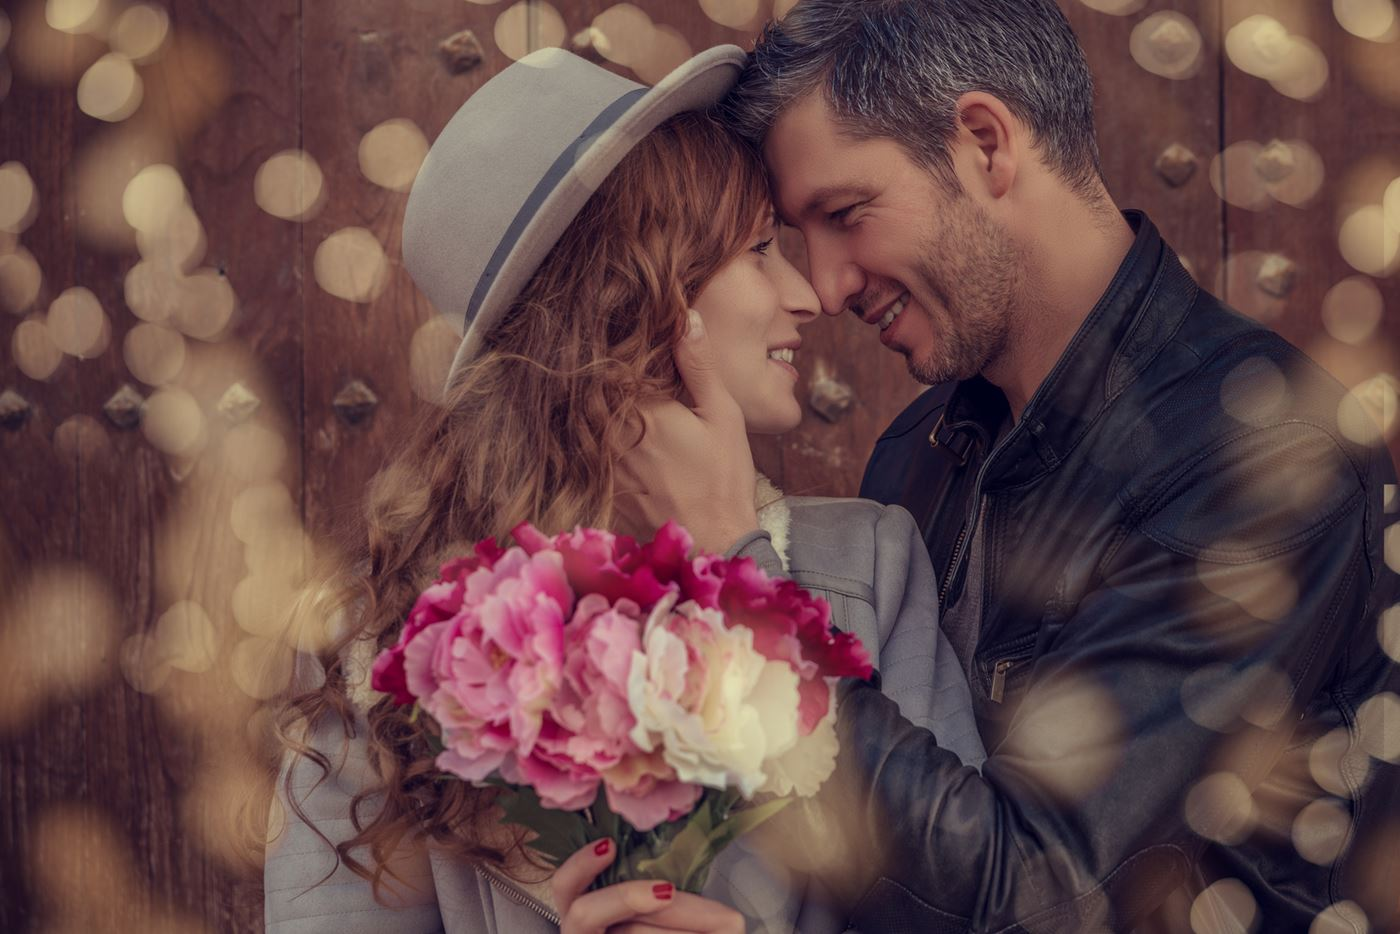 Romantische verrassing vriendin